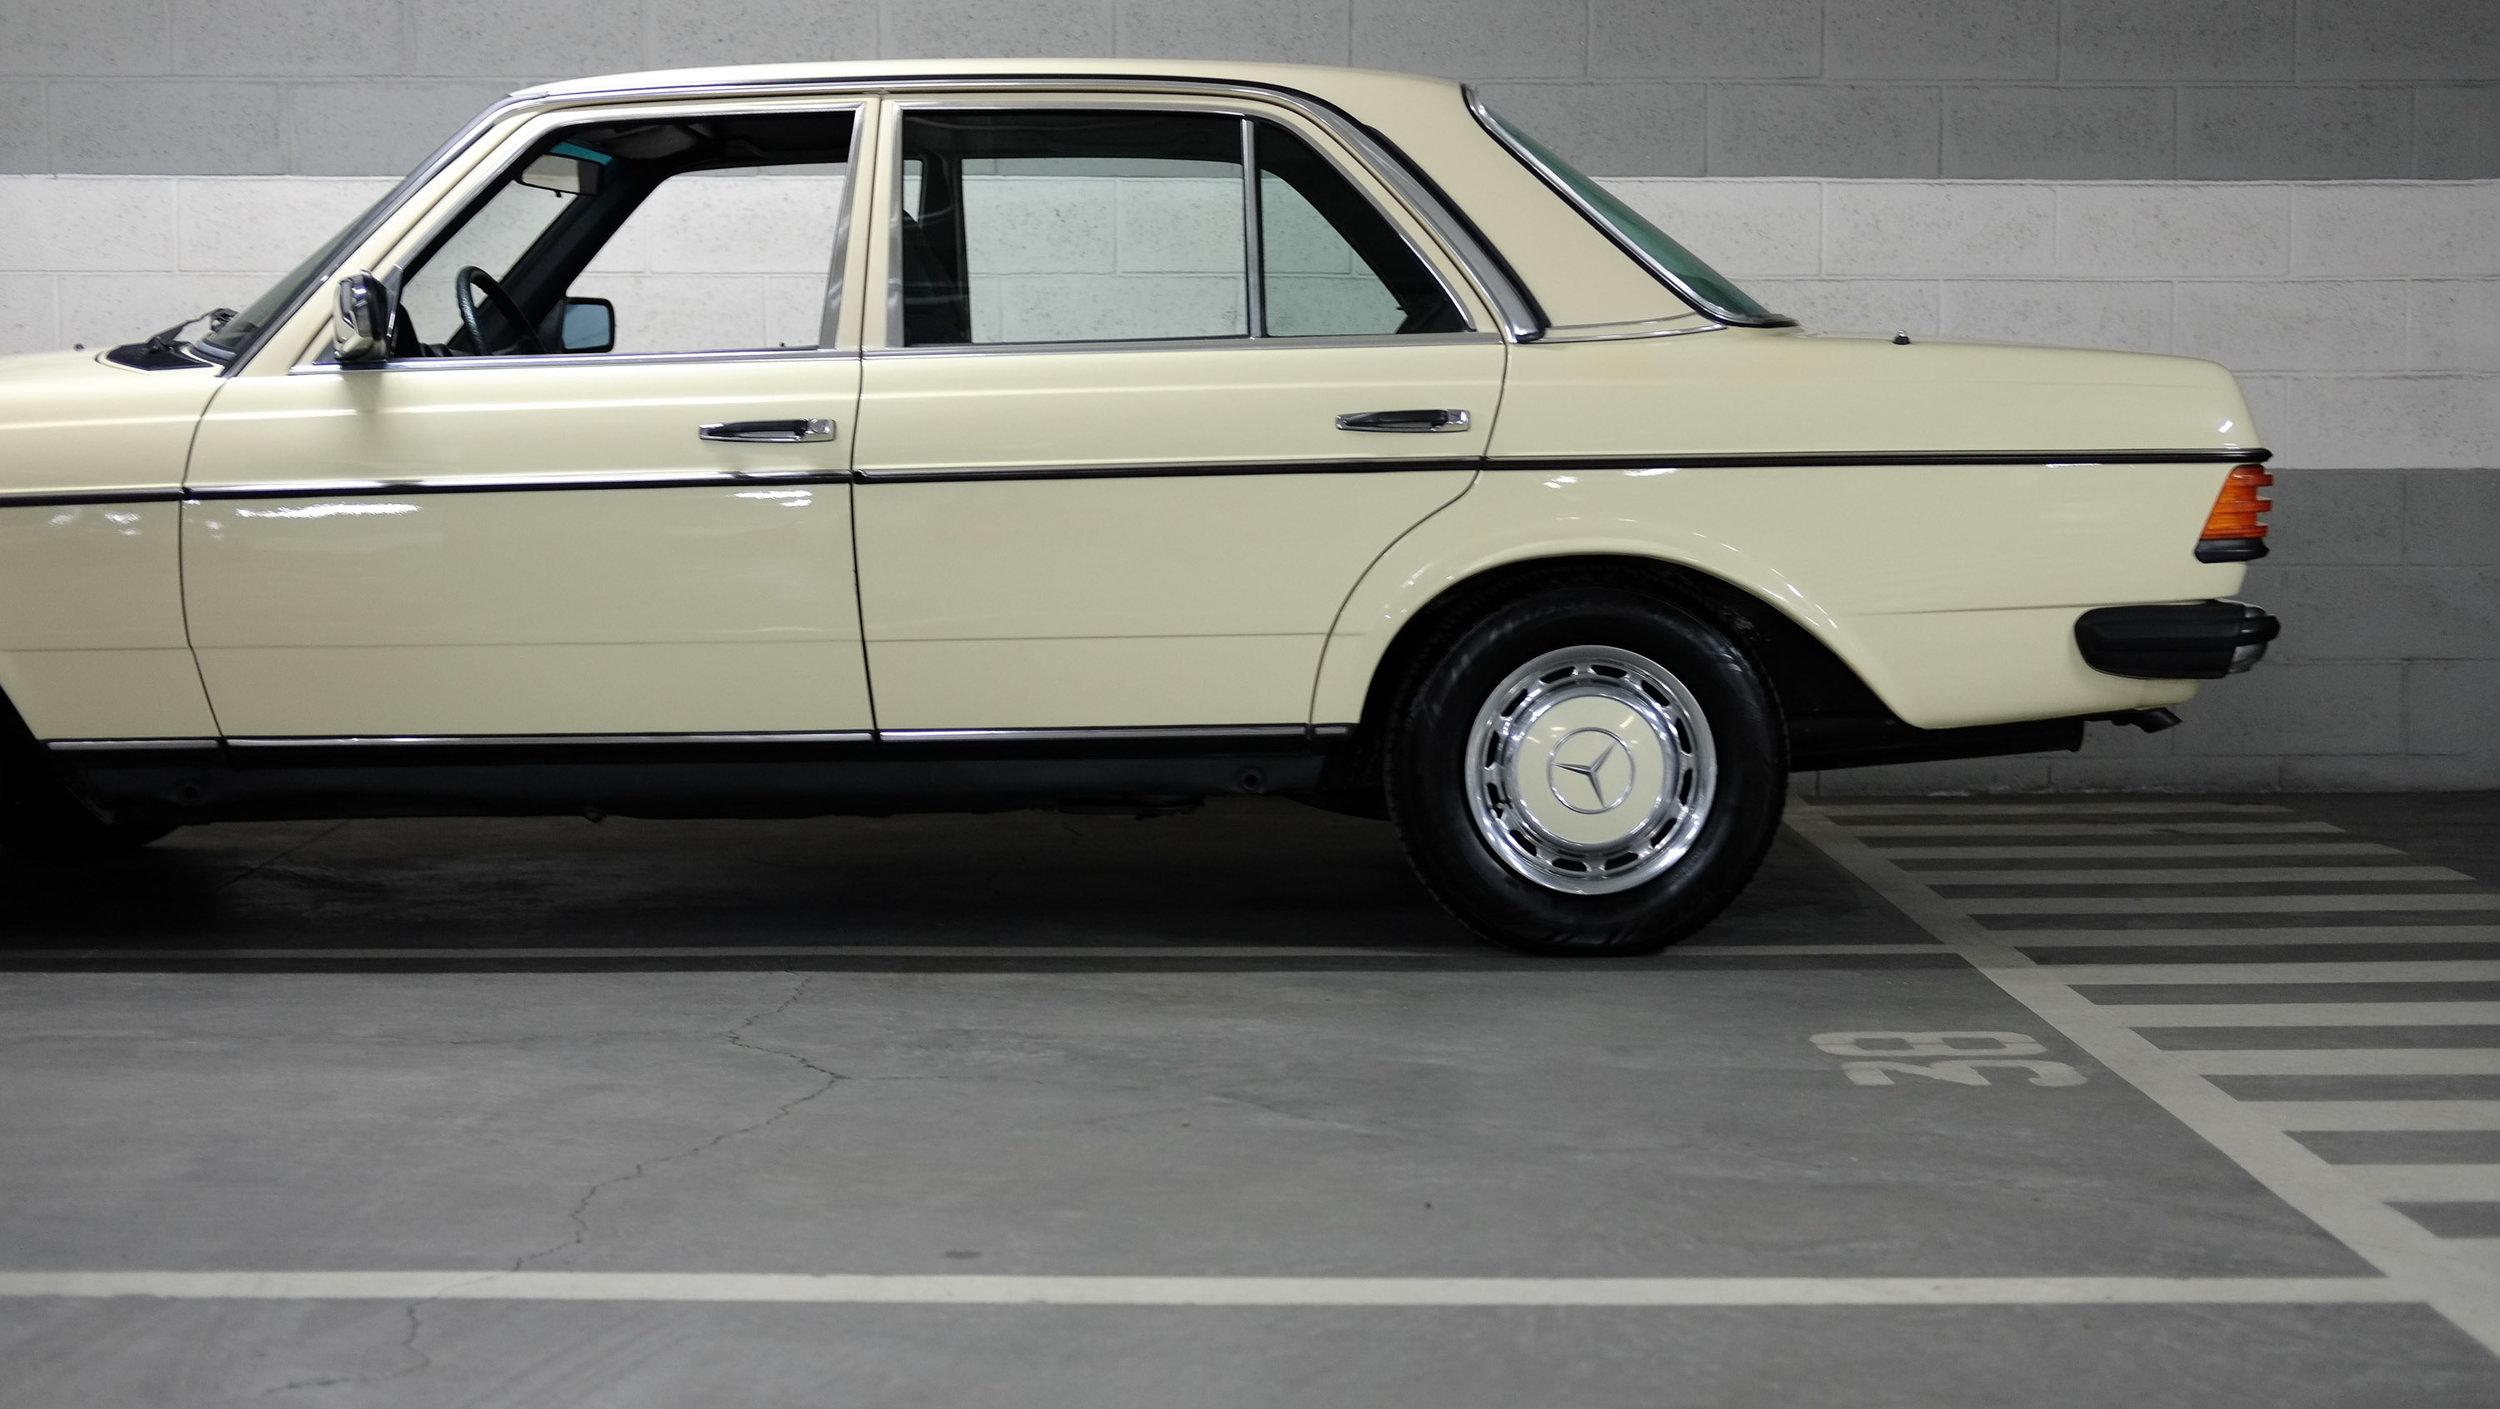 coolnvintage Mercedes-Benz W123 300D (50 of 59).jpg